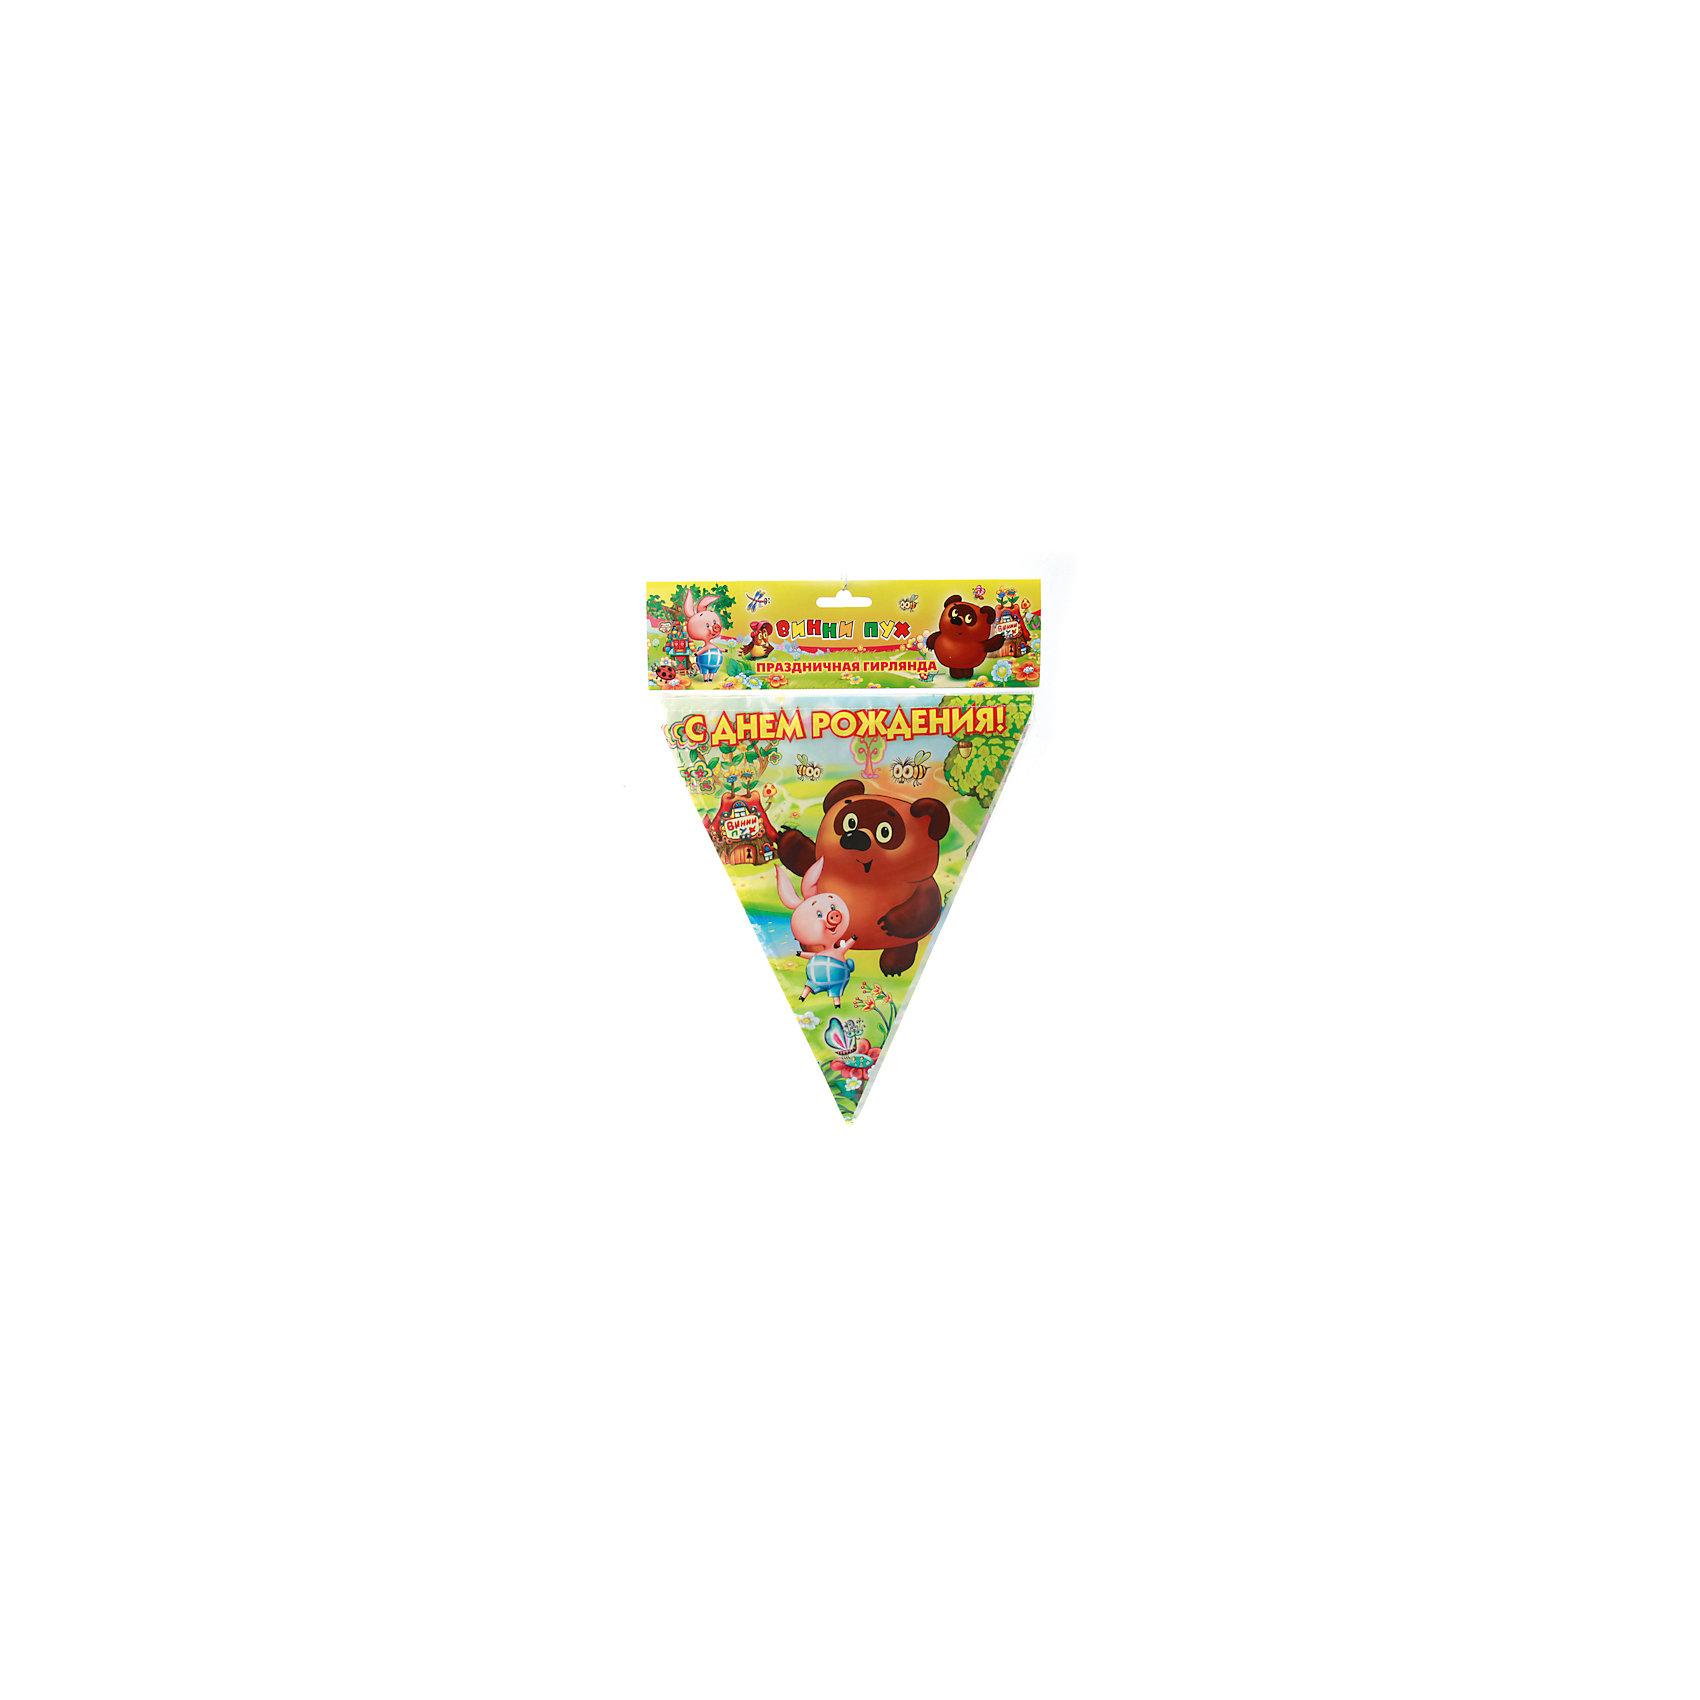 Гирлянда-флаг Винни пухГирлянда-флаг Весёлый праздник дизайн Винни пух 300 см.<br><br>Ширина мм: 320<br>Глубина мм: 240<br>Высота мм: 10<br>Вес г: 20<br>Возраст от месяцев: 12<br>Возраст до месяцев: 72<br>Пол: Унисекс<br>Возраст: Детский<br>SKU: 5196933